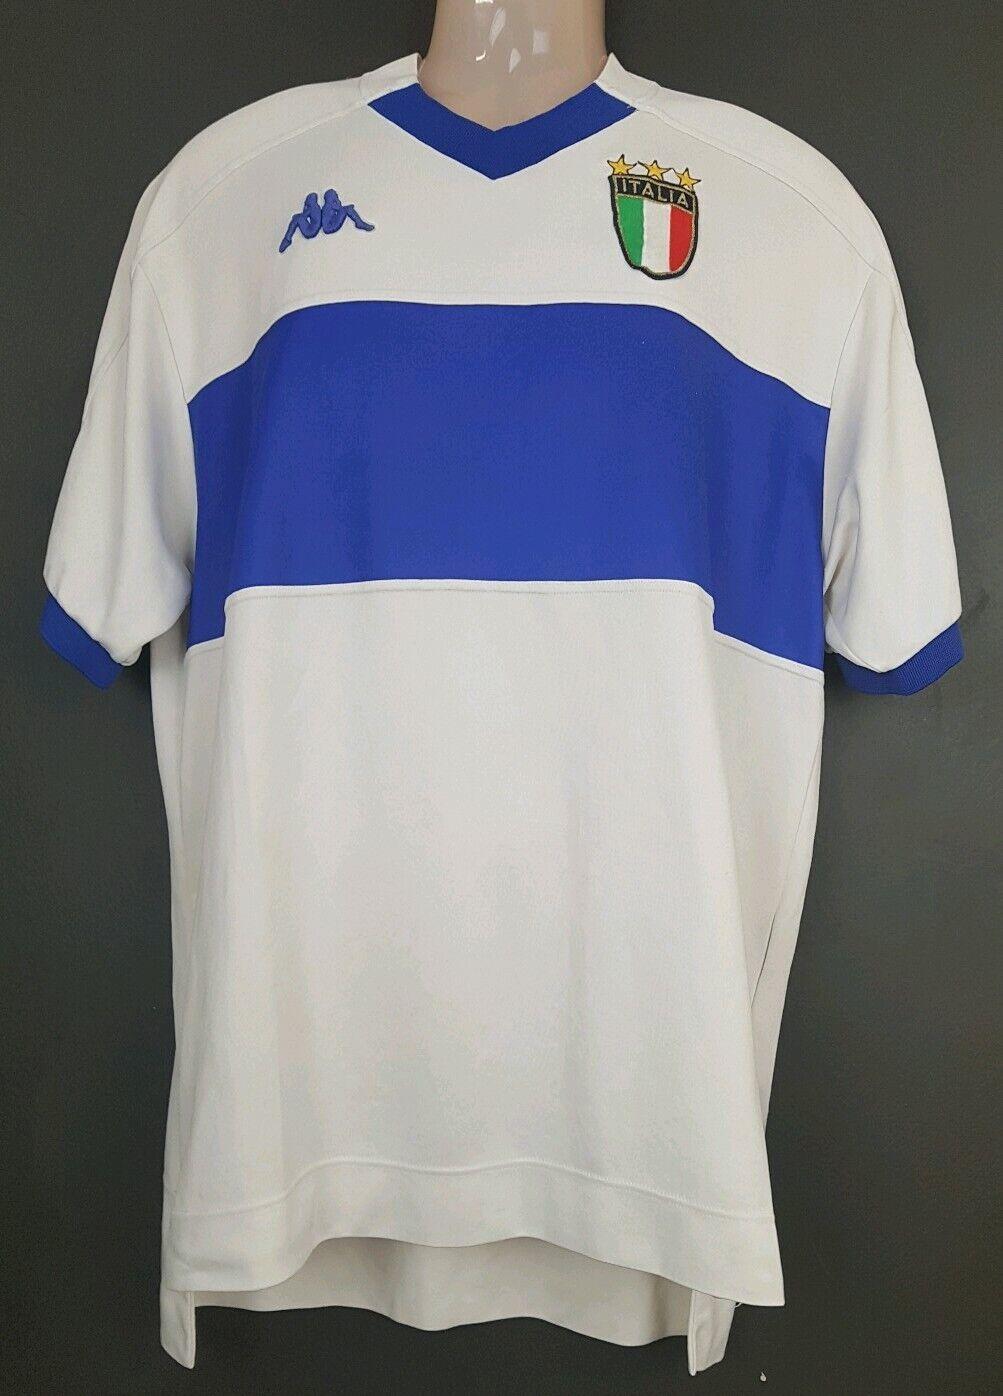 Kappa 1999 football soccer jersey shirt XL rare collectable white